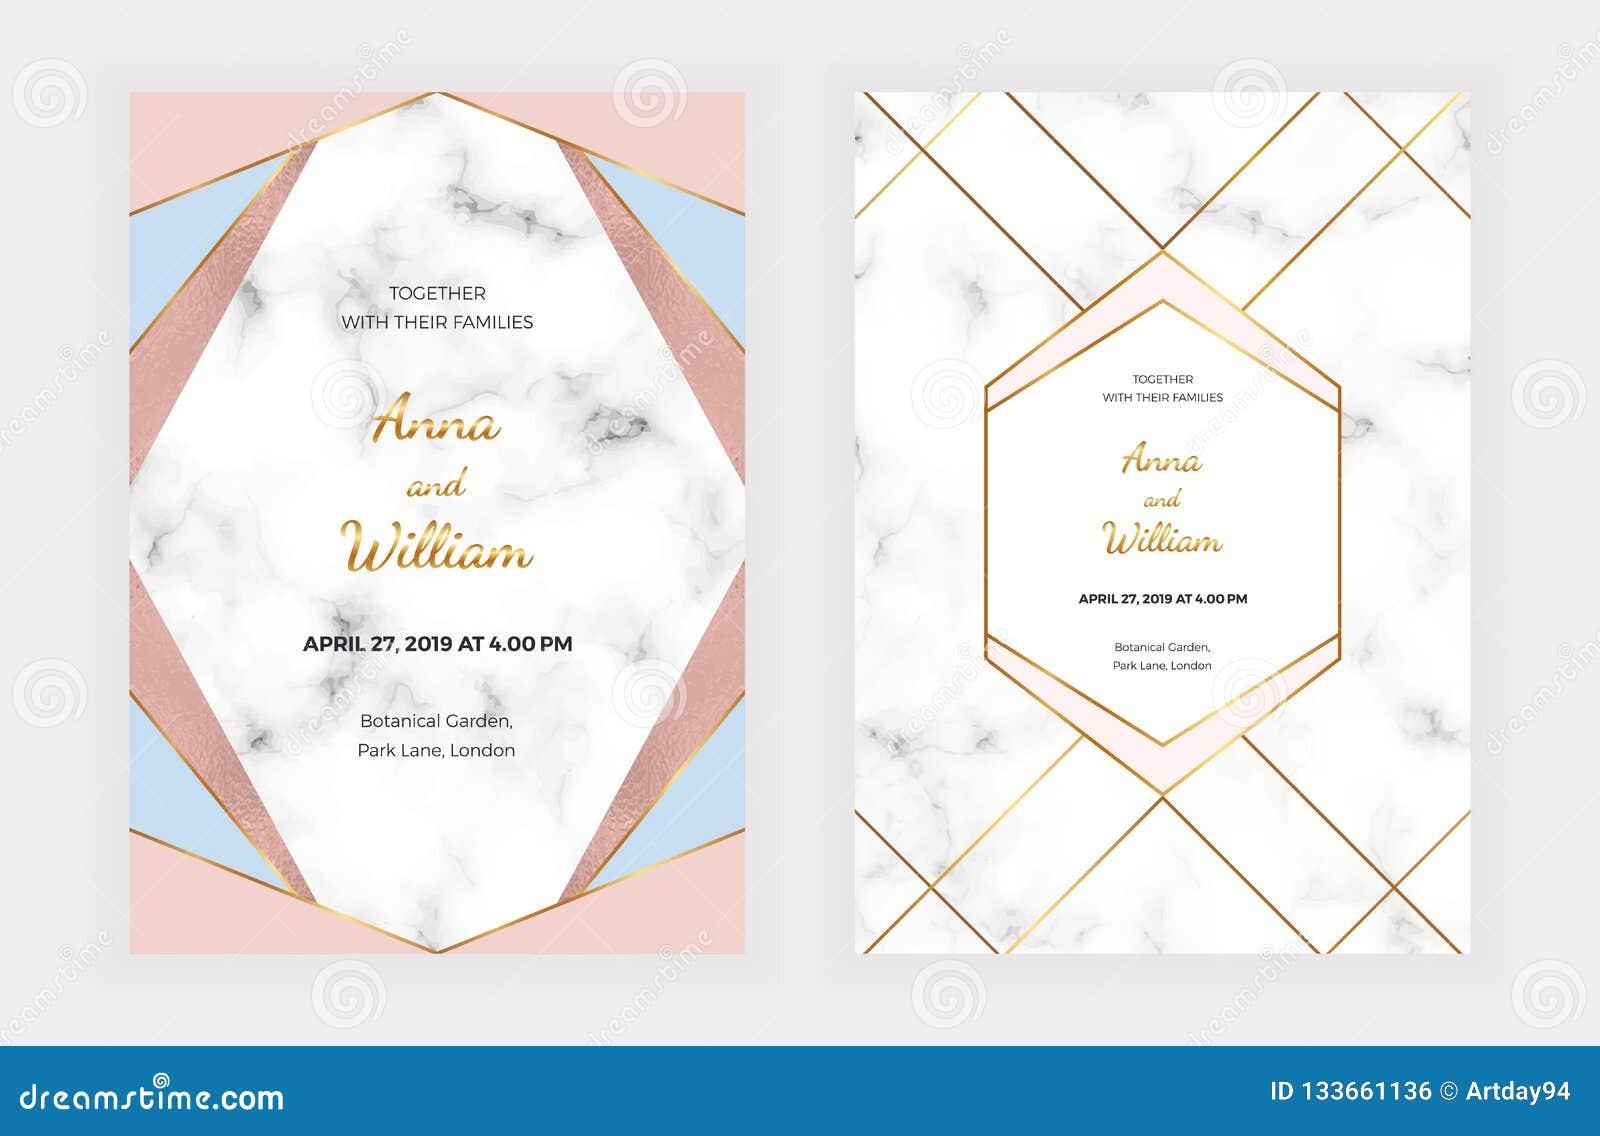 Wedding Invitation Cards With Pink Blue Geometric Design